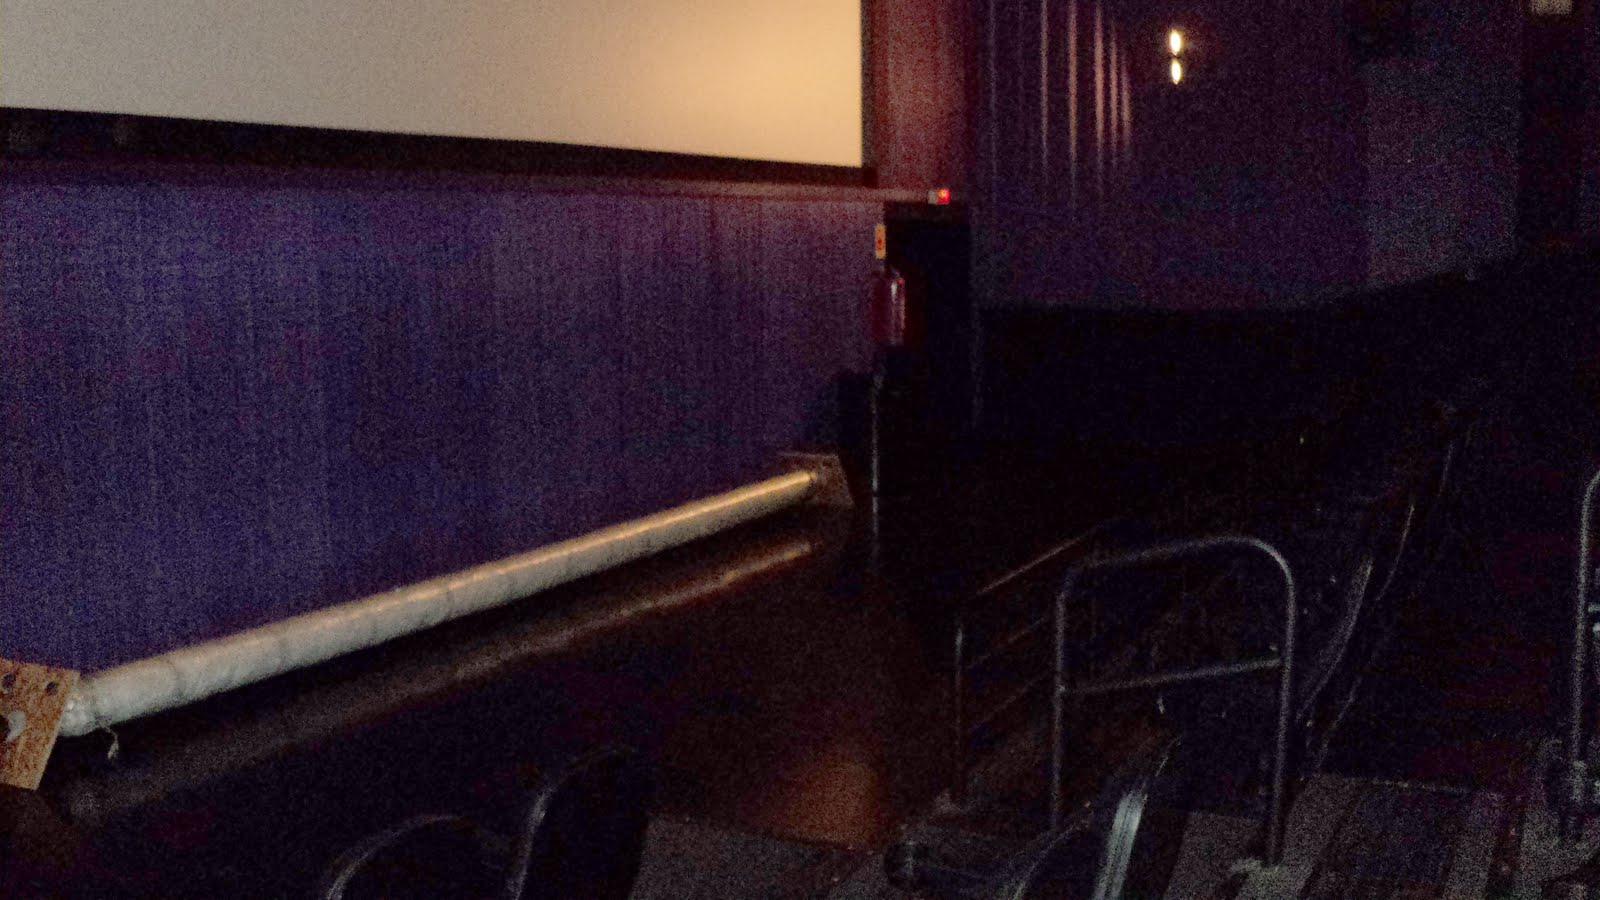 Cubbos Consultoria: Cinema e Acessibilidade. Post 1. Cinemark Bourbon  #A76924 1600 900